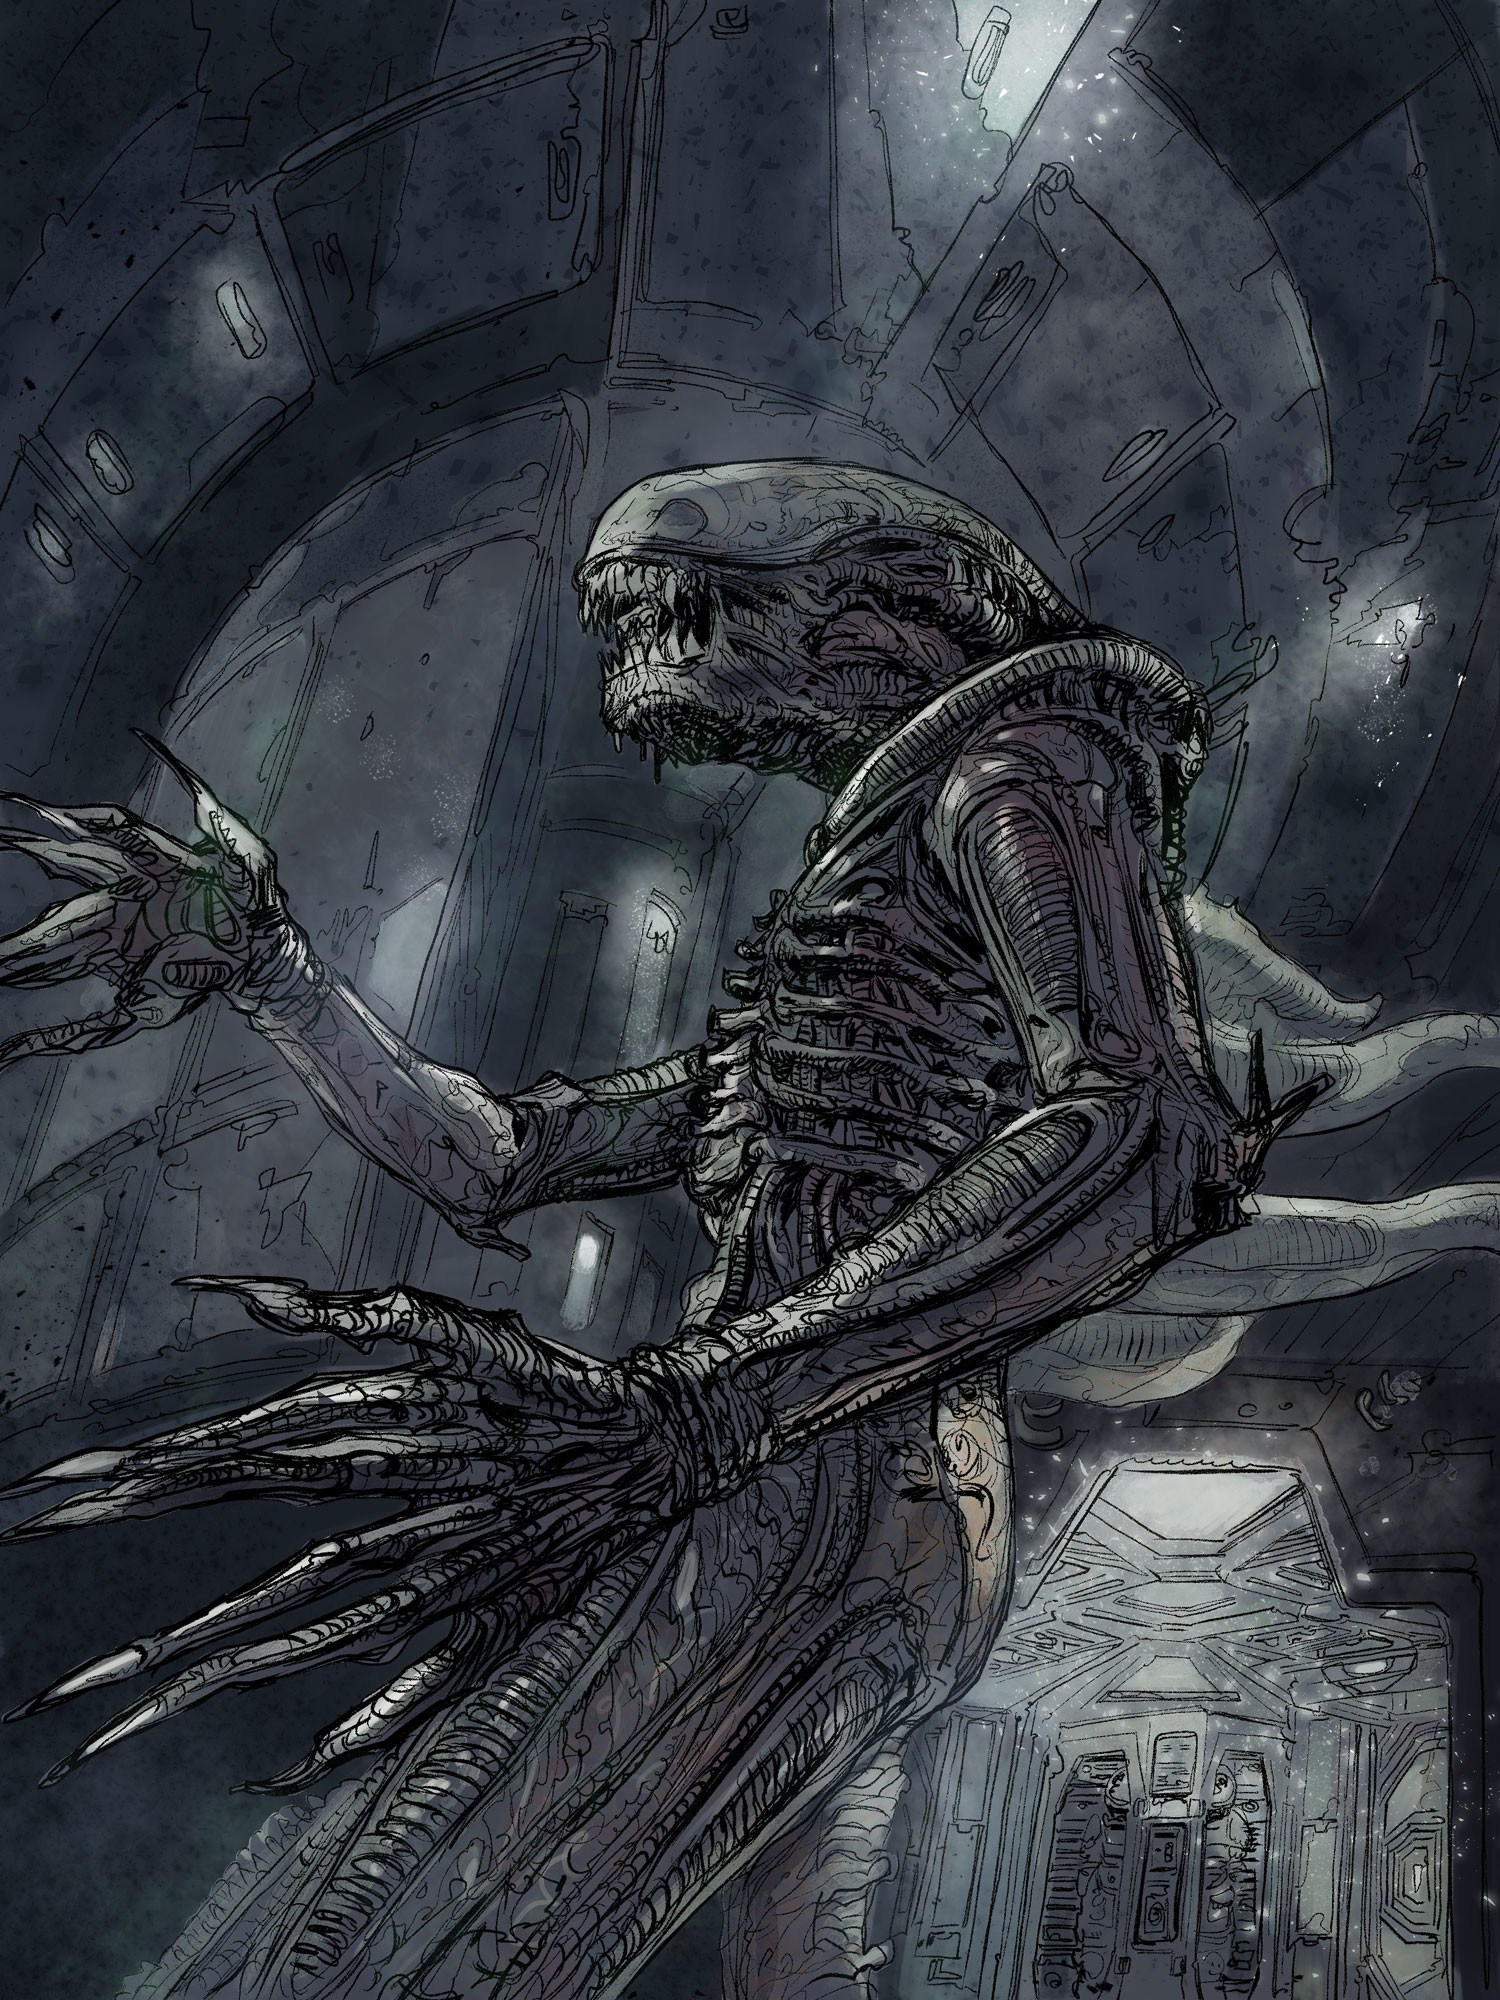 daniele-afferni-daniele-afferni-artist-alien-nostromo